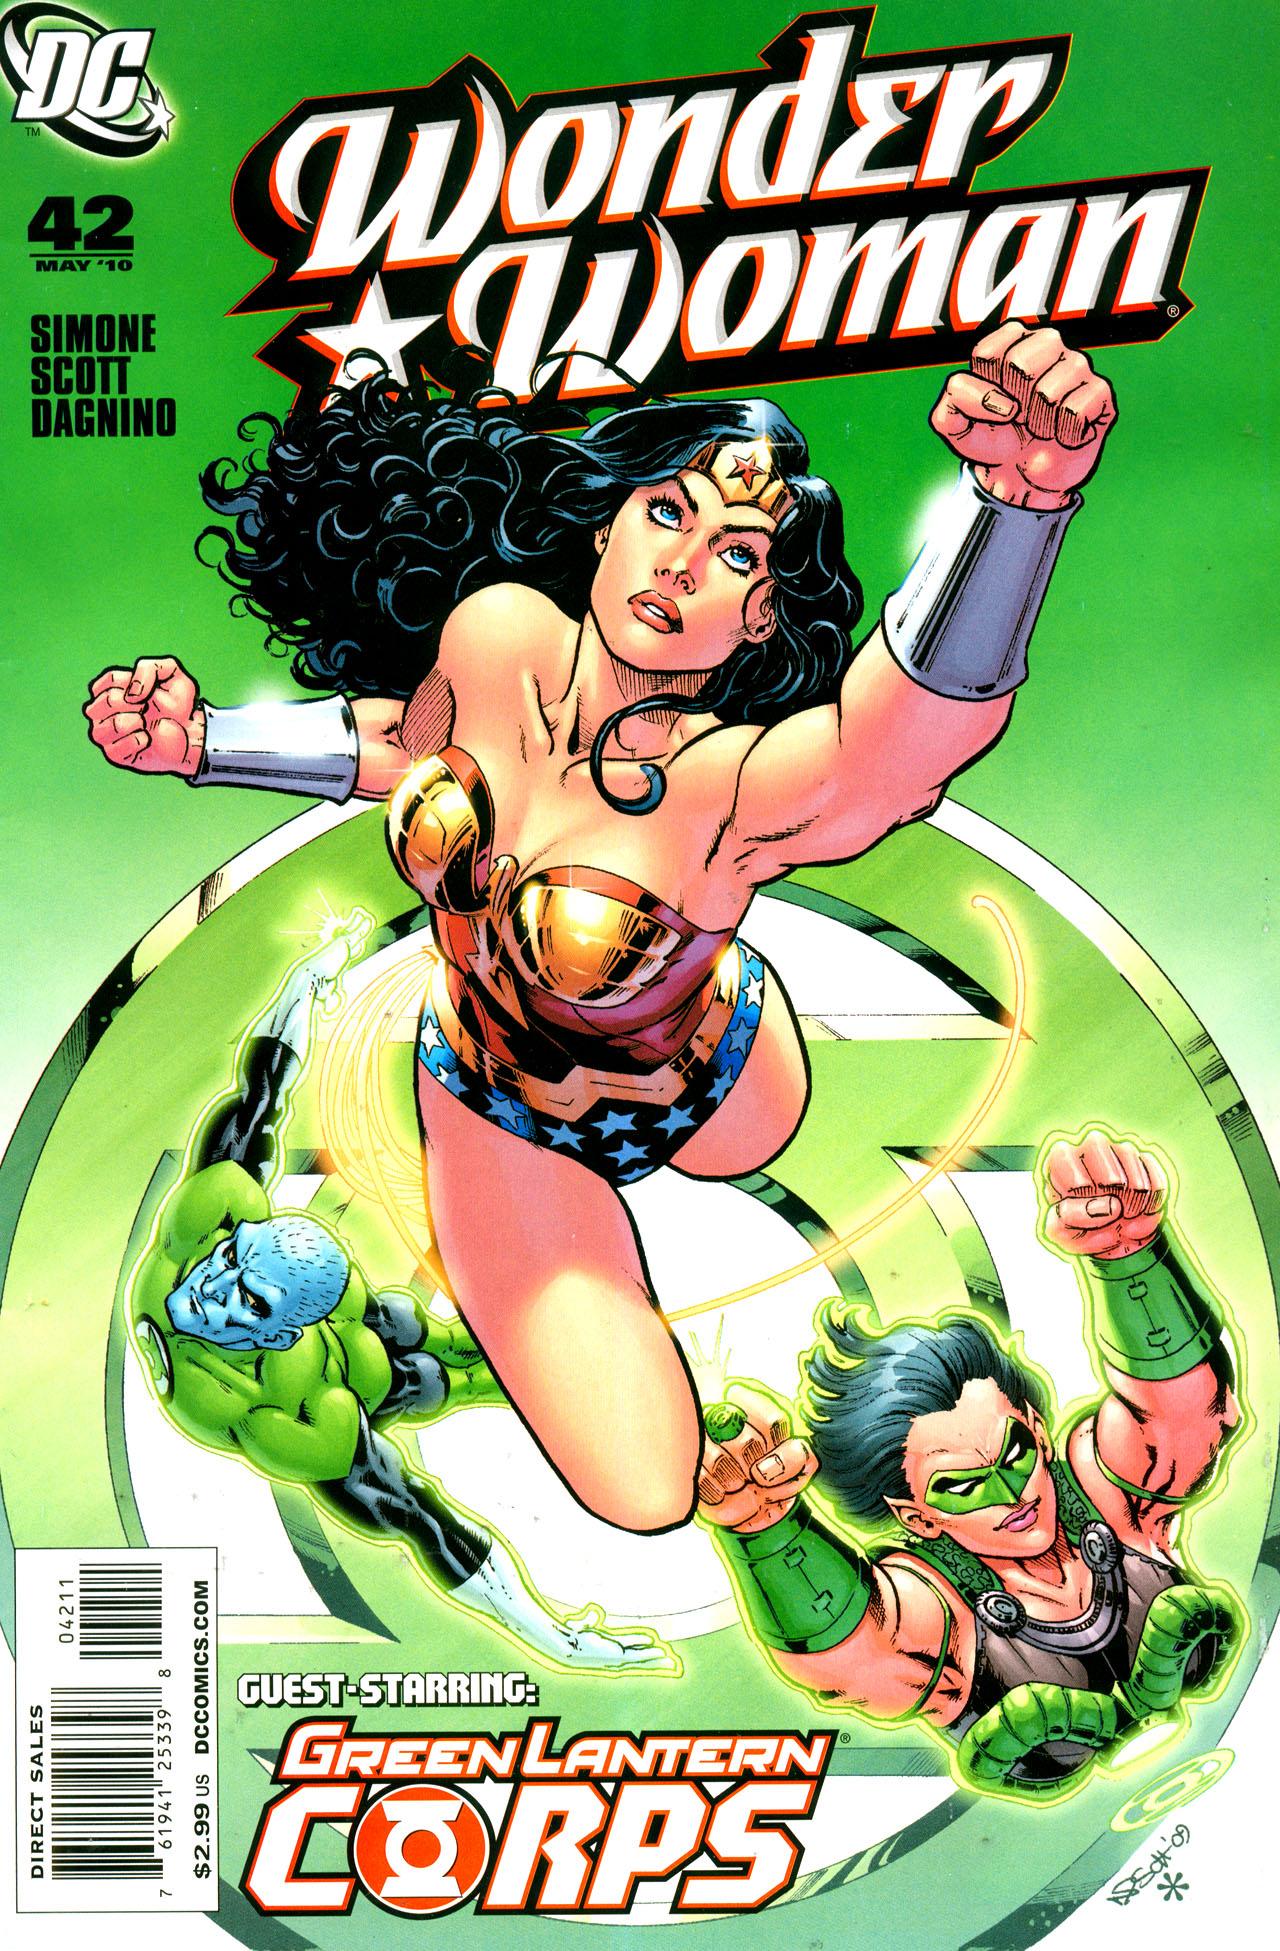 Read online Wonder Woman (2006) comic -  Issue #42 - 1